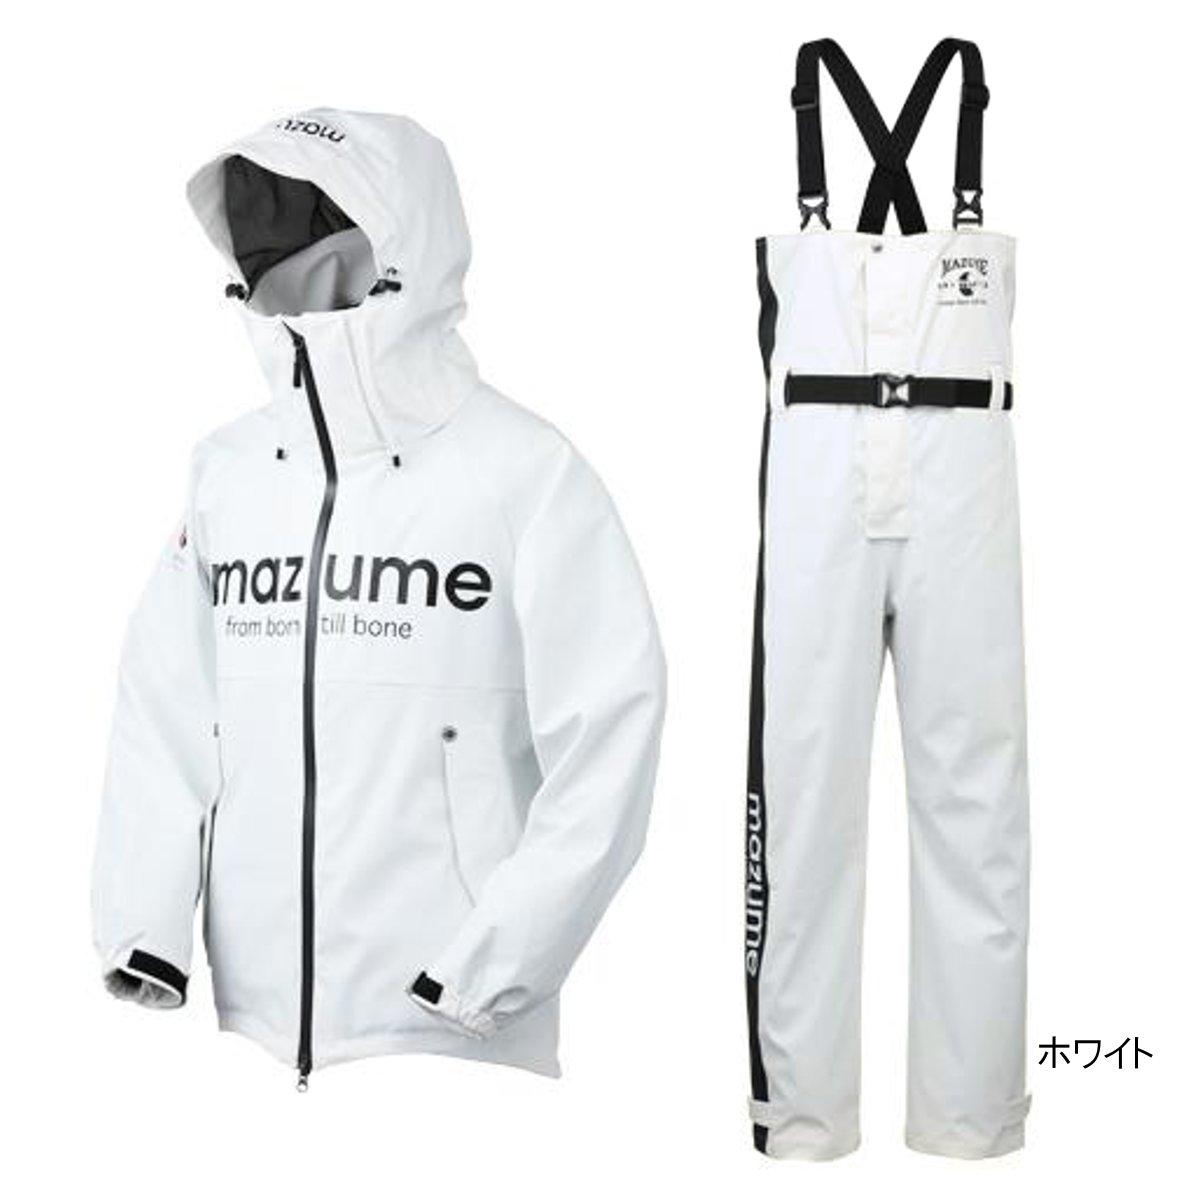 mazume ROUGH WATER レインスーツ II MZRS-383 LL ホワイト